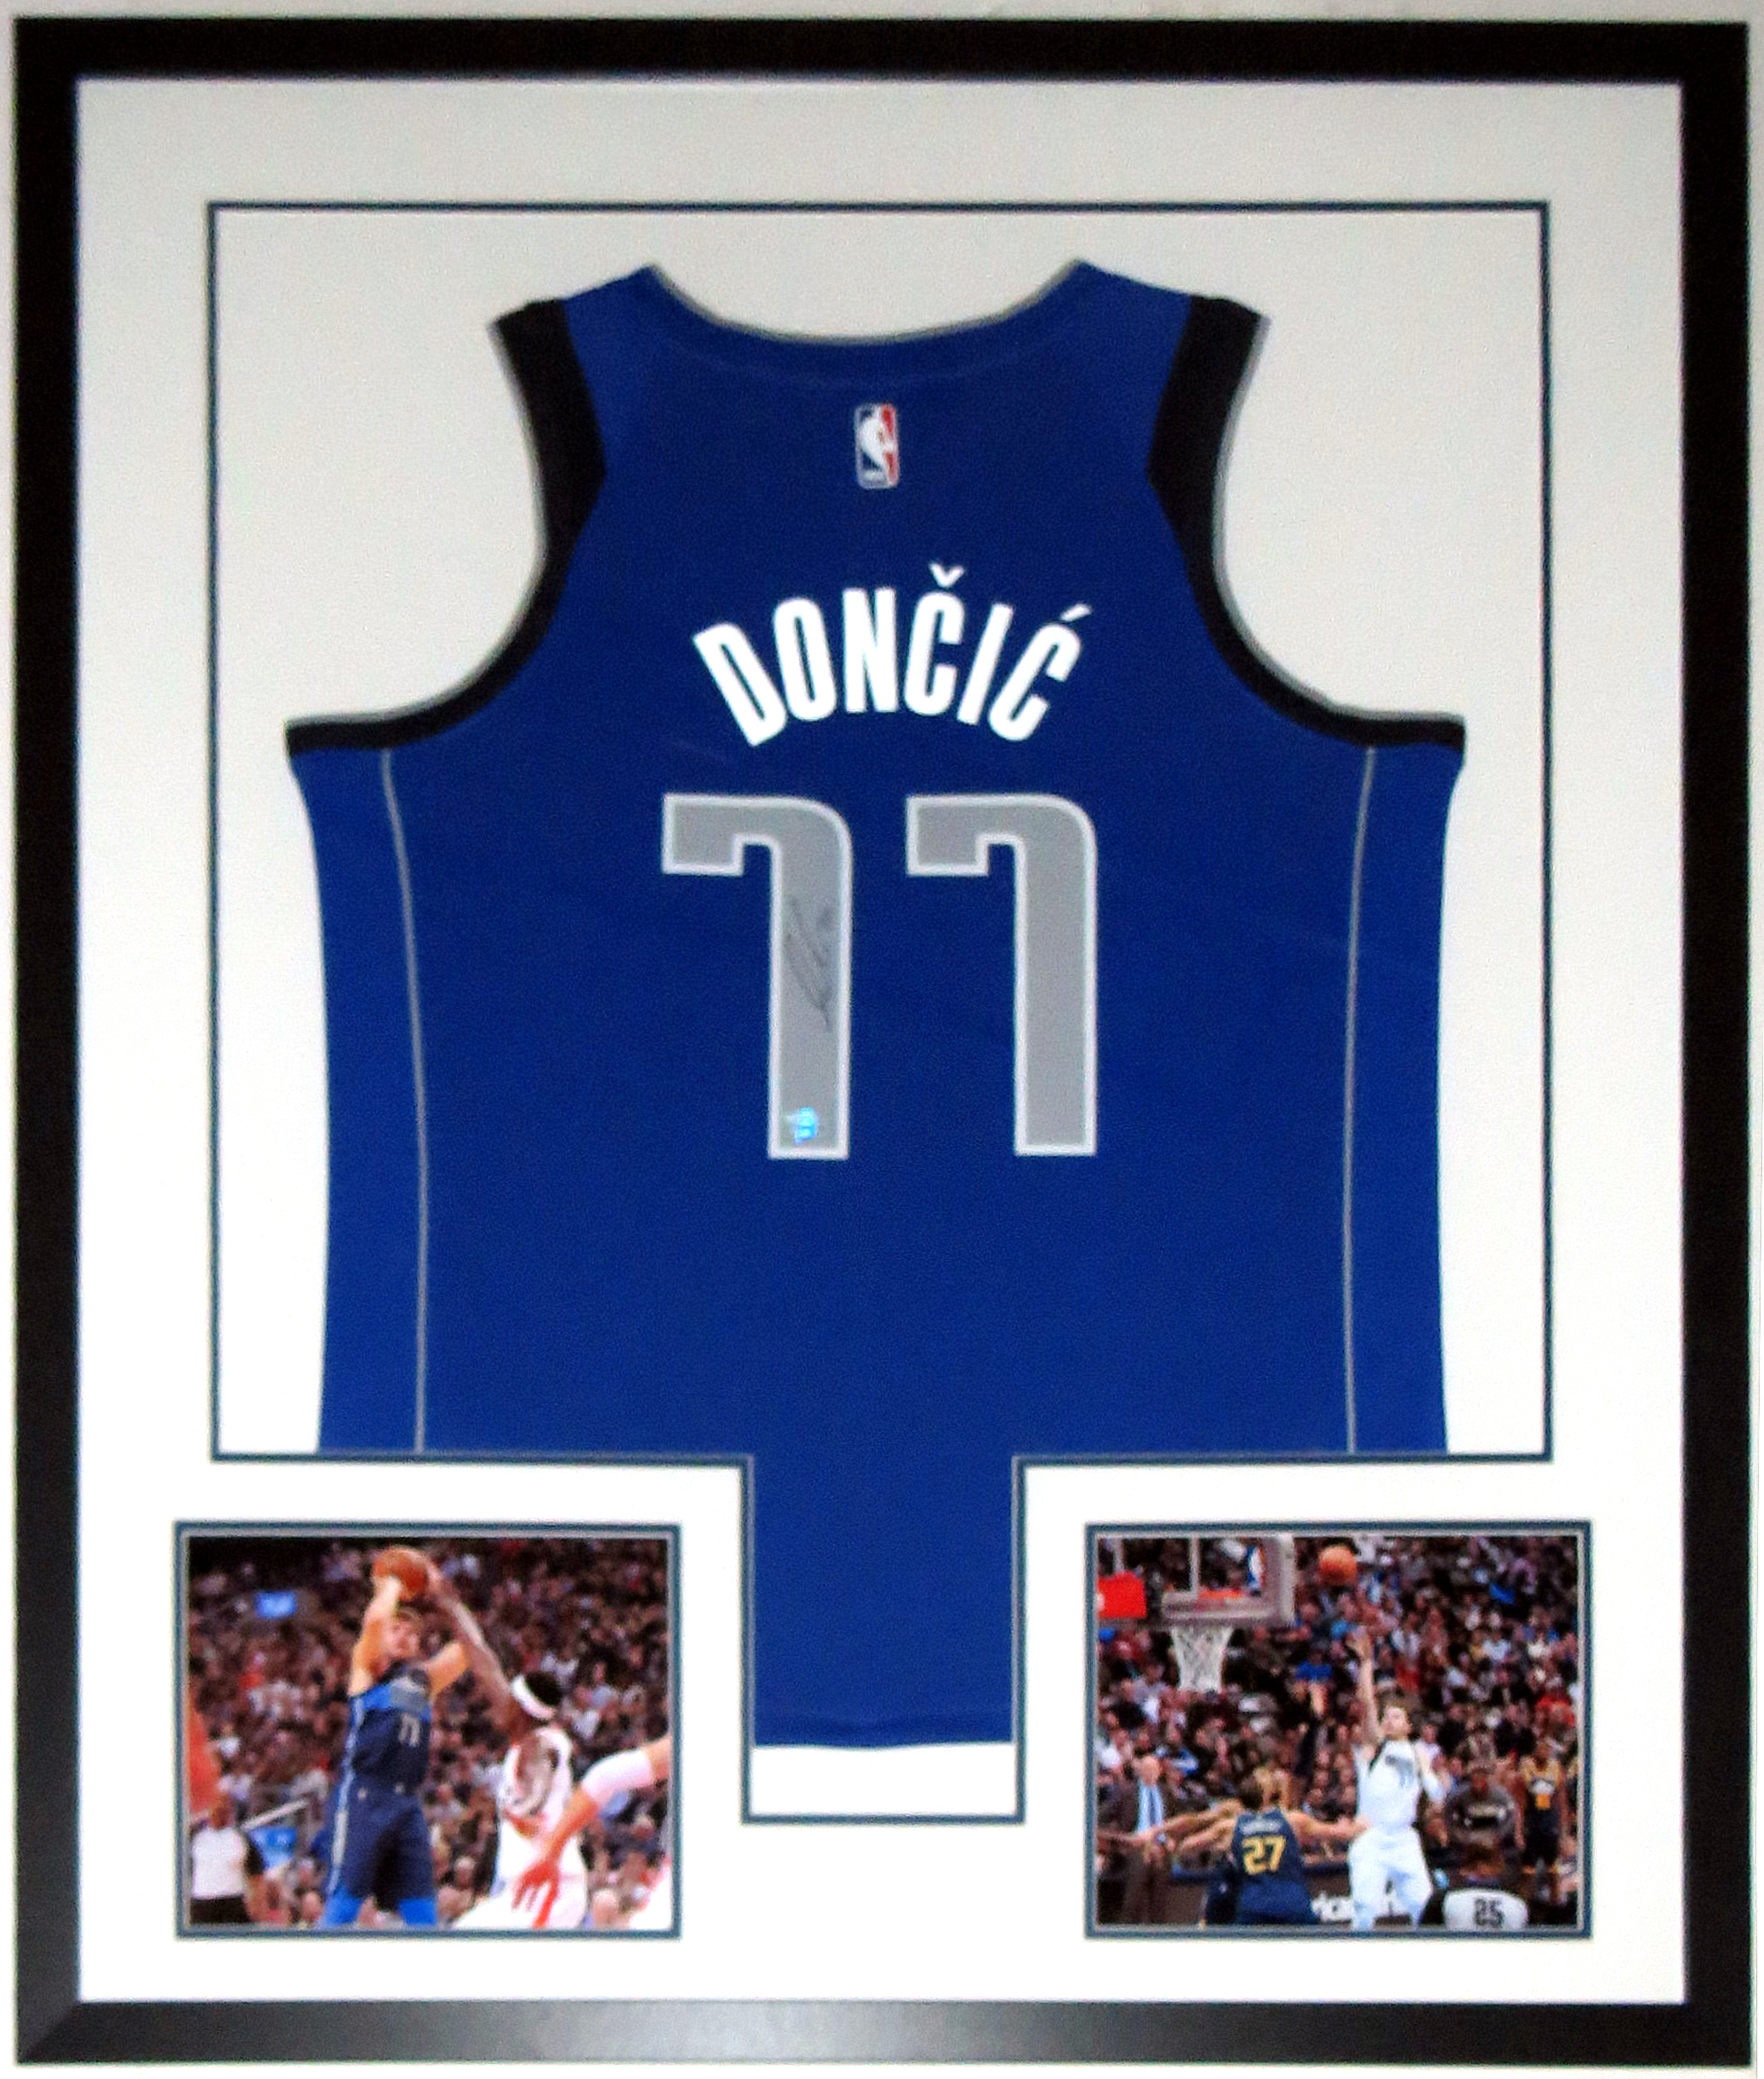 Luka Doncic Autographed Nike Dallas Mavericks Jersey - Fanatics COA Authenticated - Professionally Framed & 2 Rookie Year 8x10 Photo